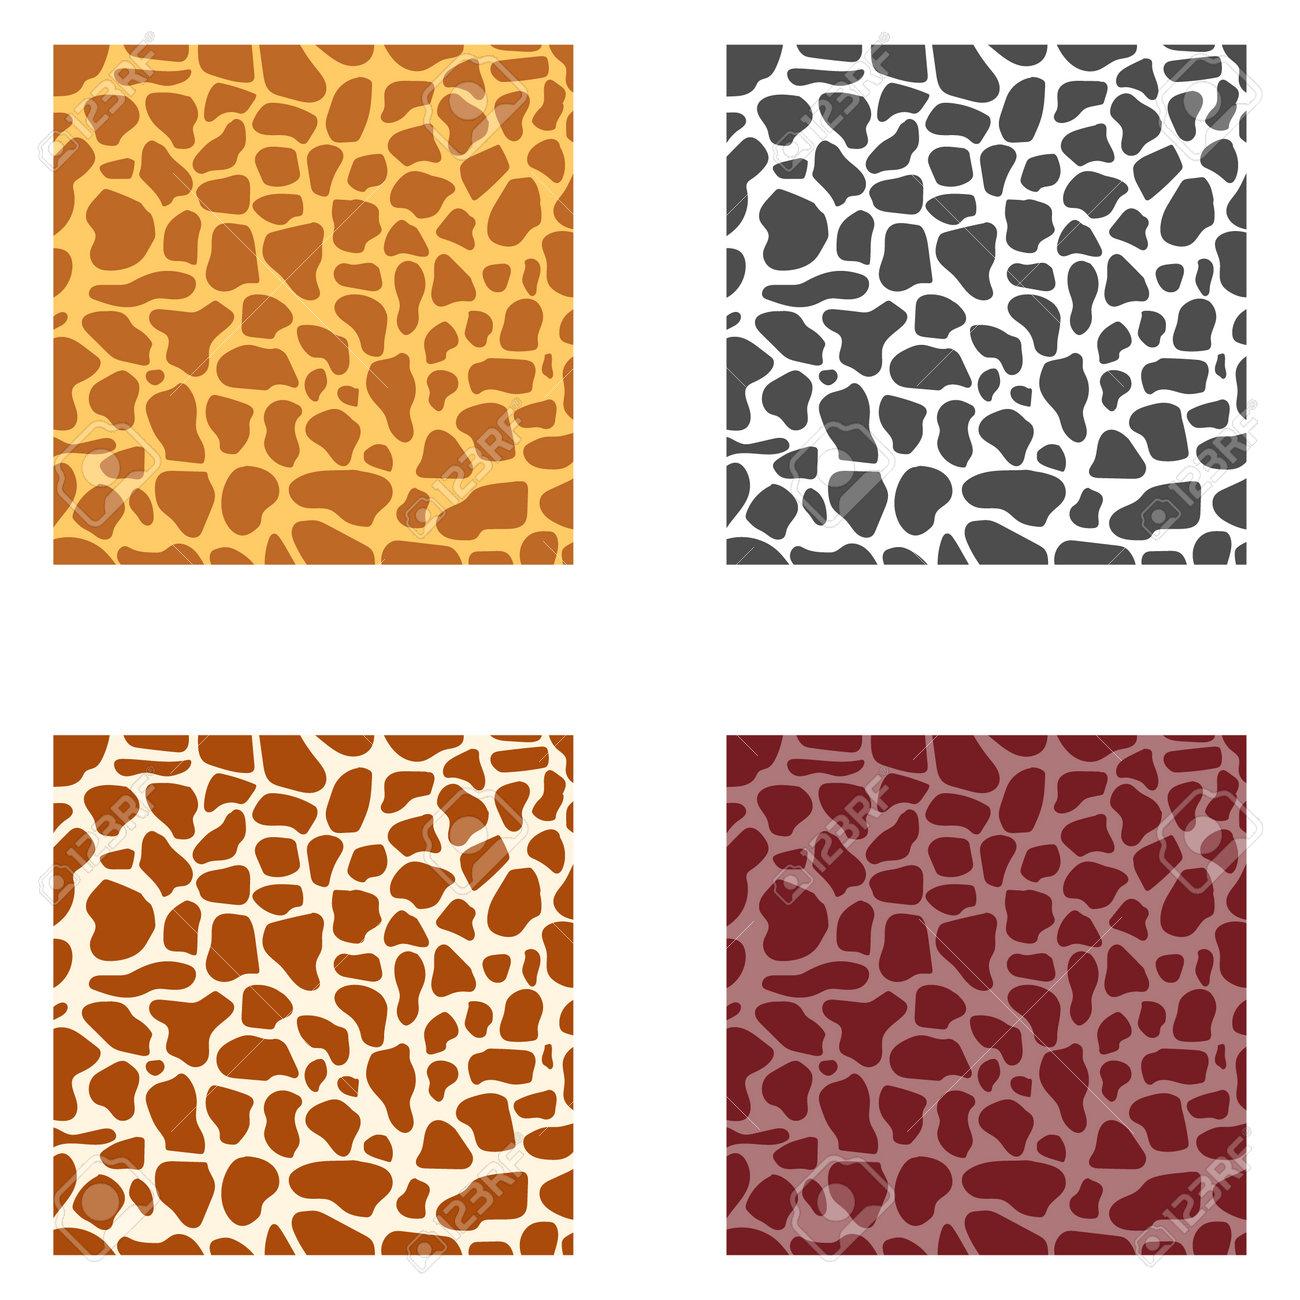 Leopard skin, giraffe. Leopard, giraffe skin texture. Vector illustration. Vector. - 162890913